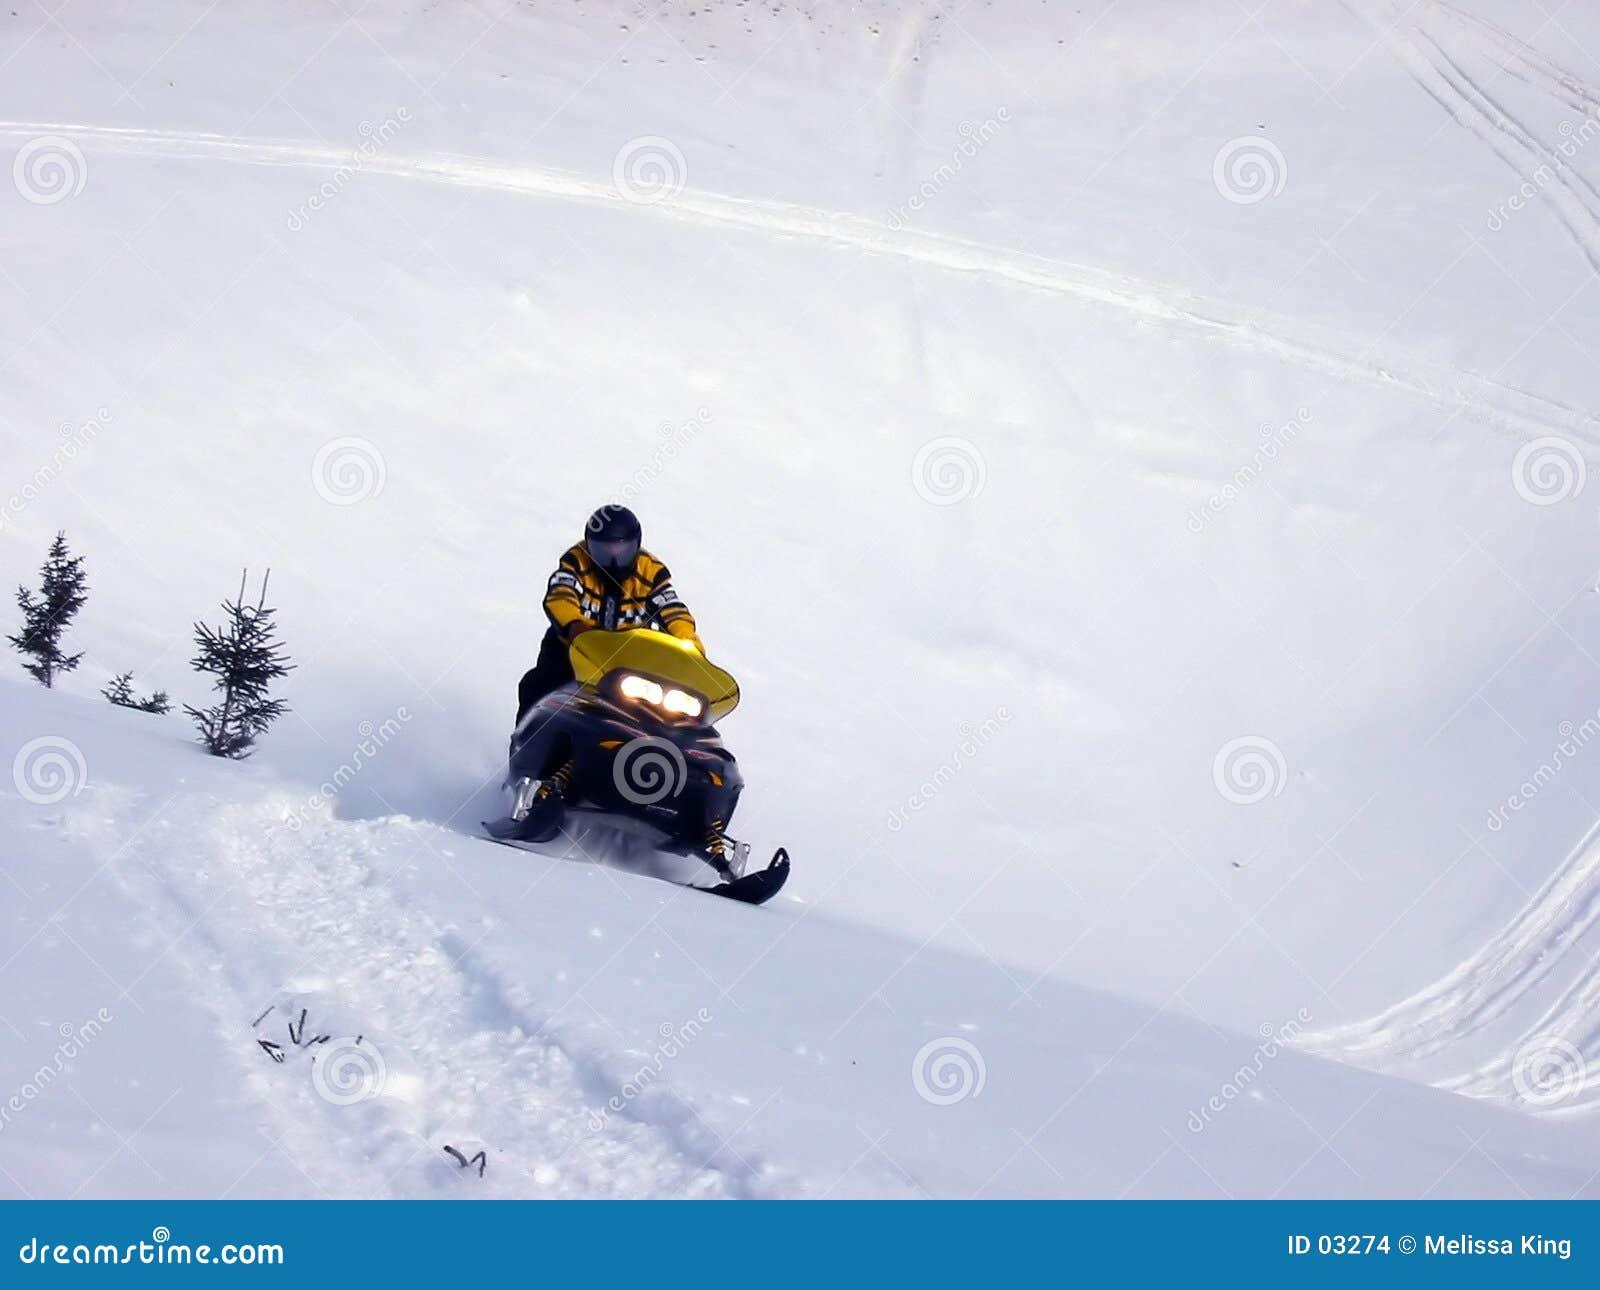 Ski-Doo in Sneeuw